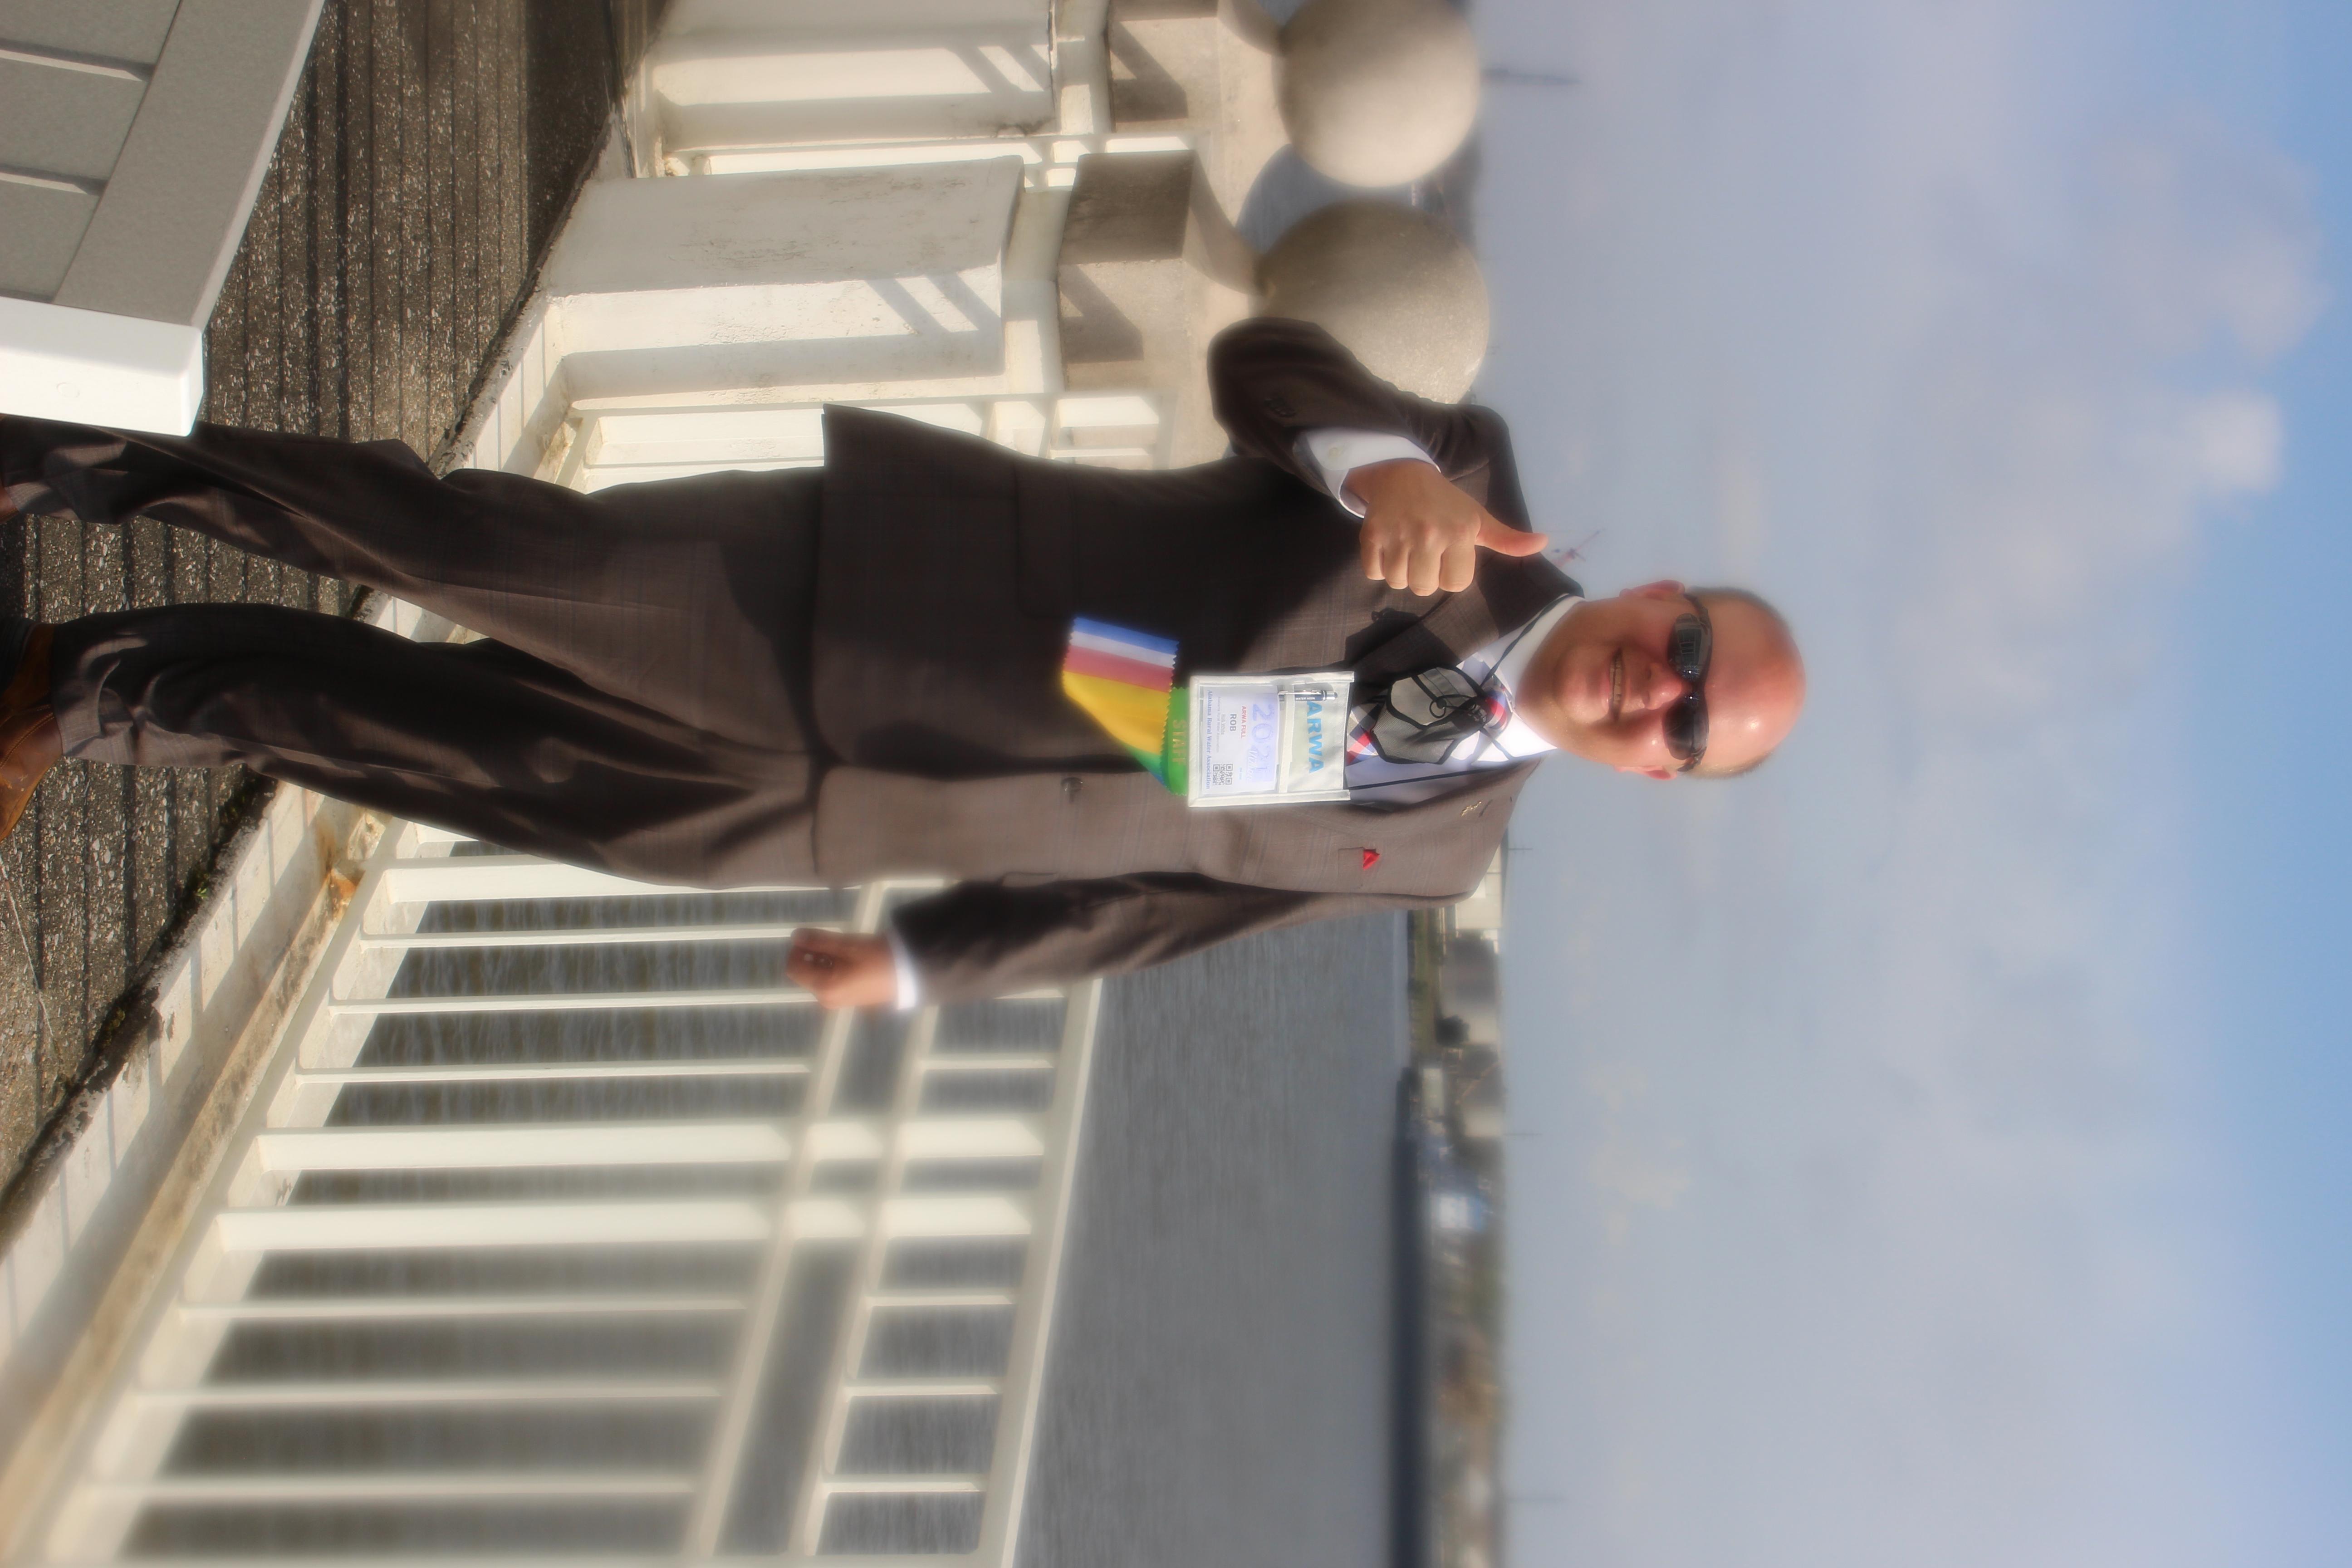 Rob White IV, Executive Director